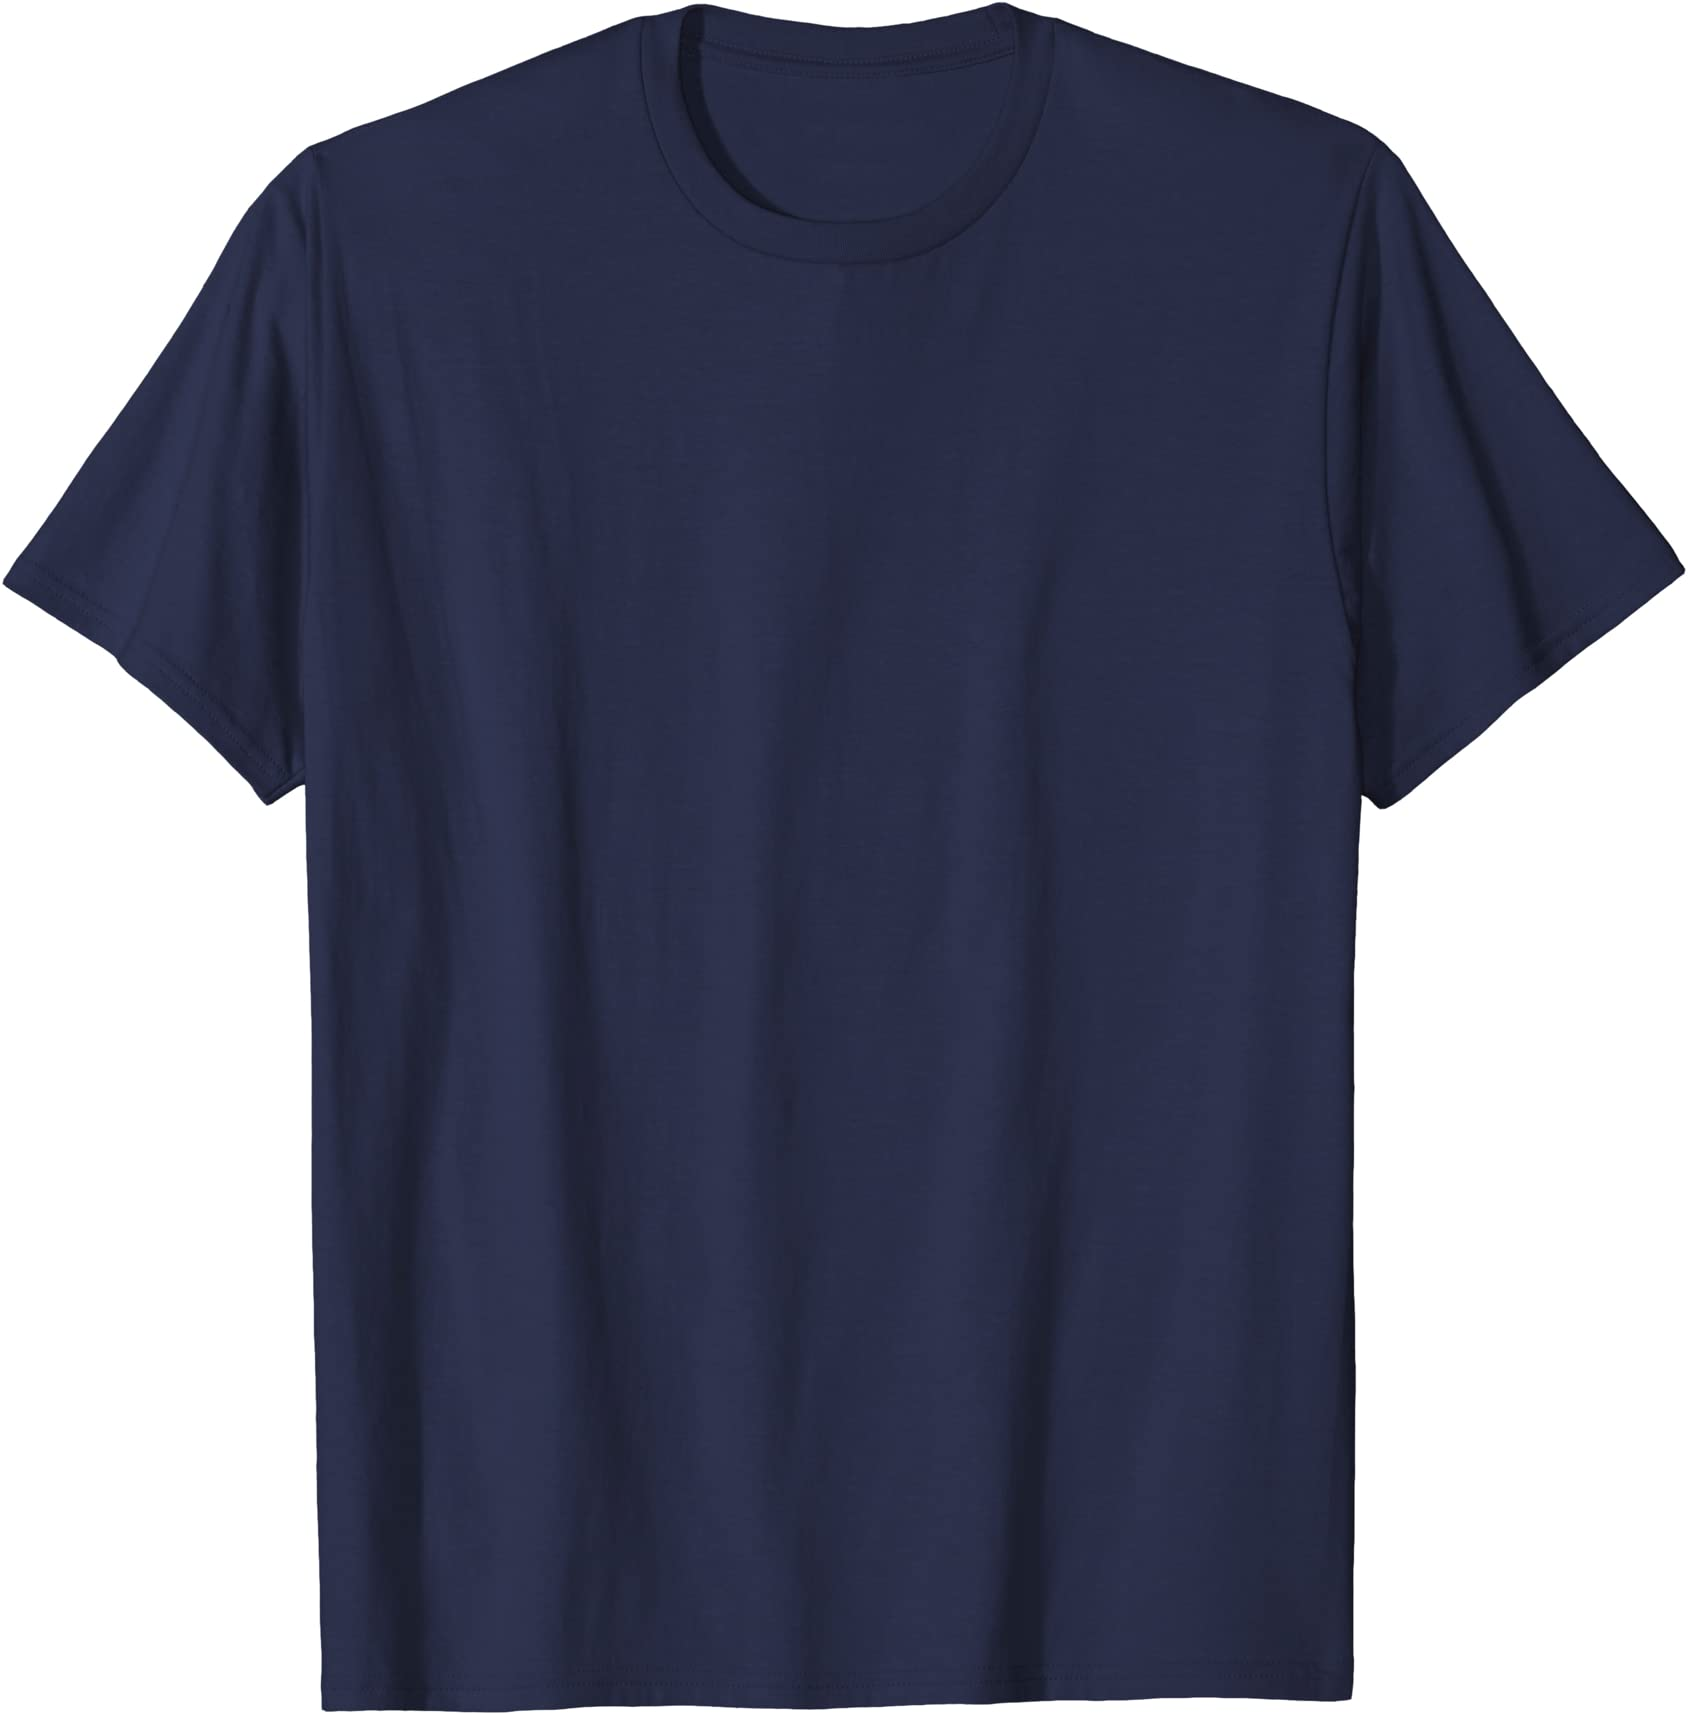 TWA Globe US Airline Aviation Black T-Shirt size S-3XL